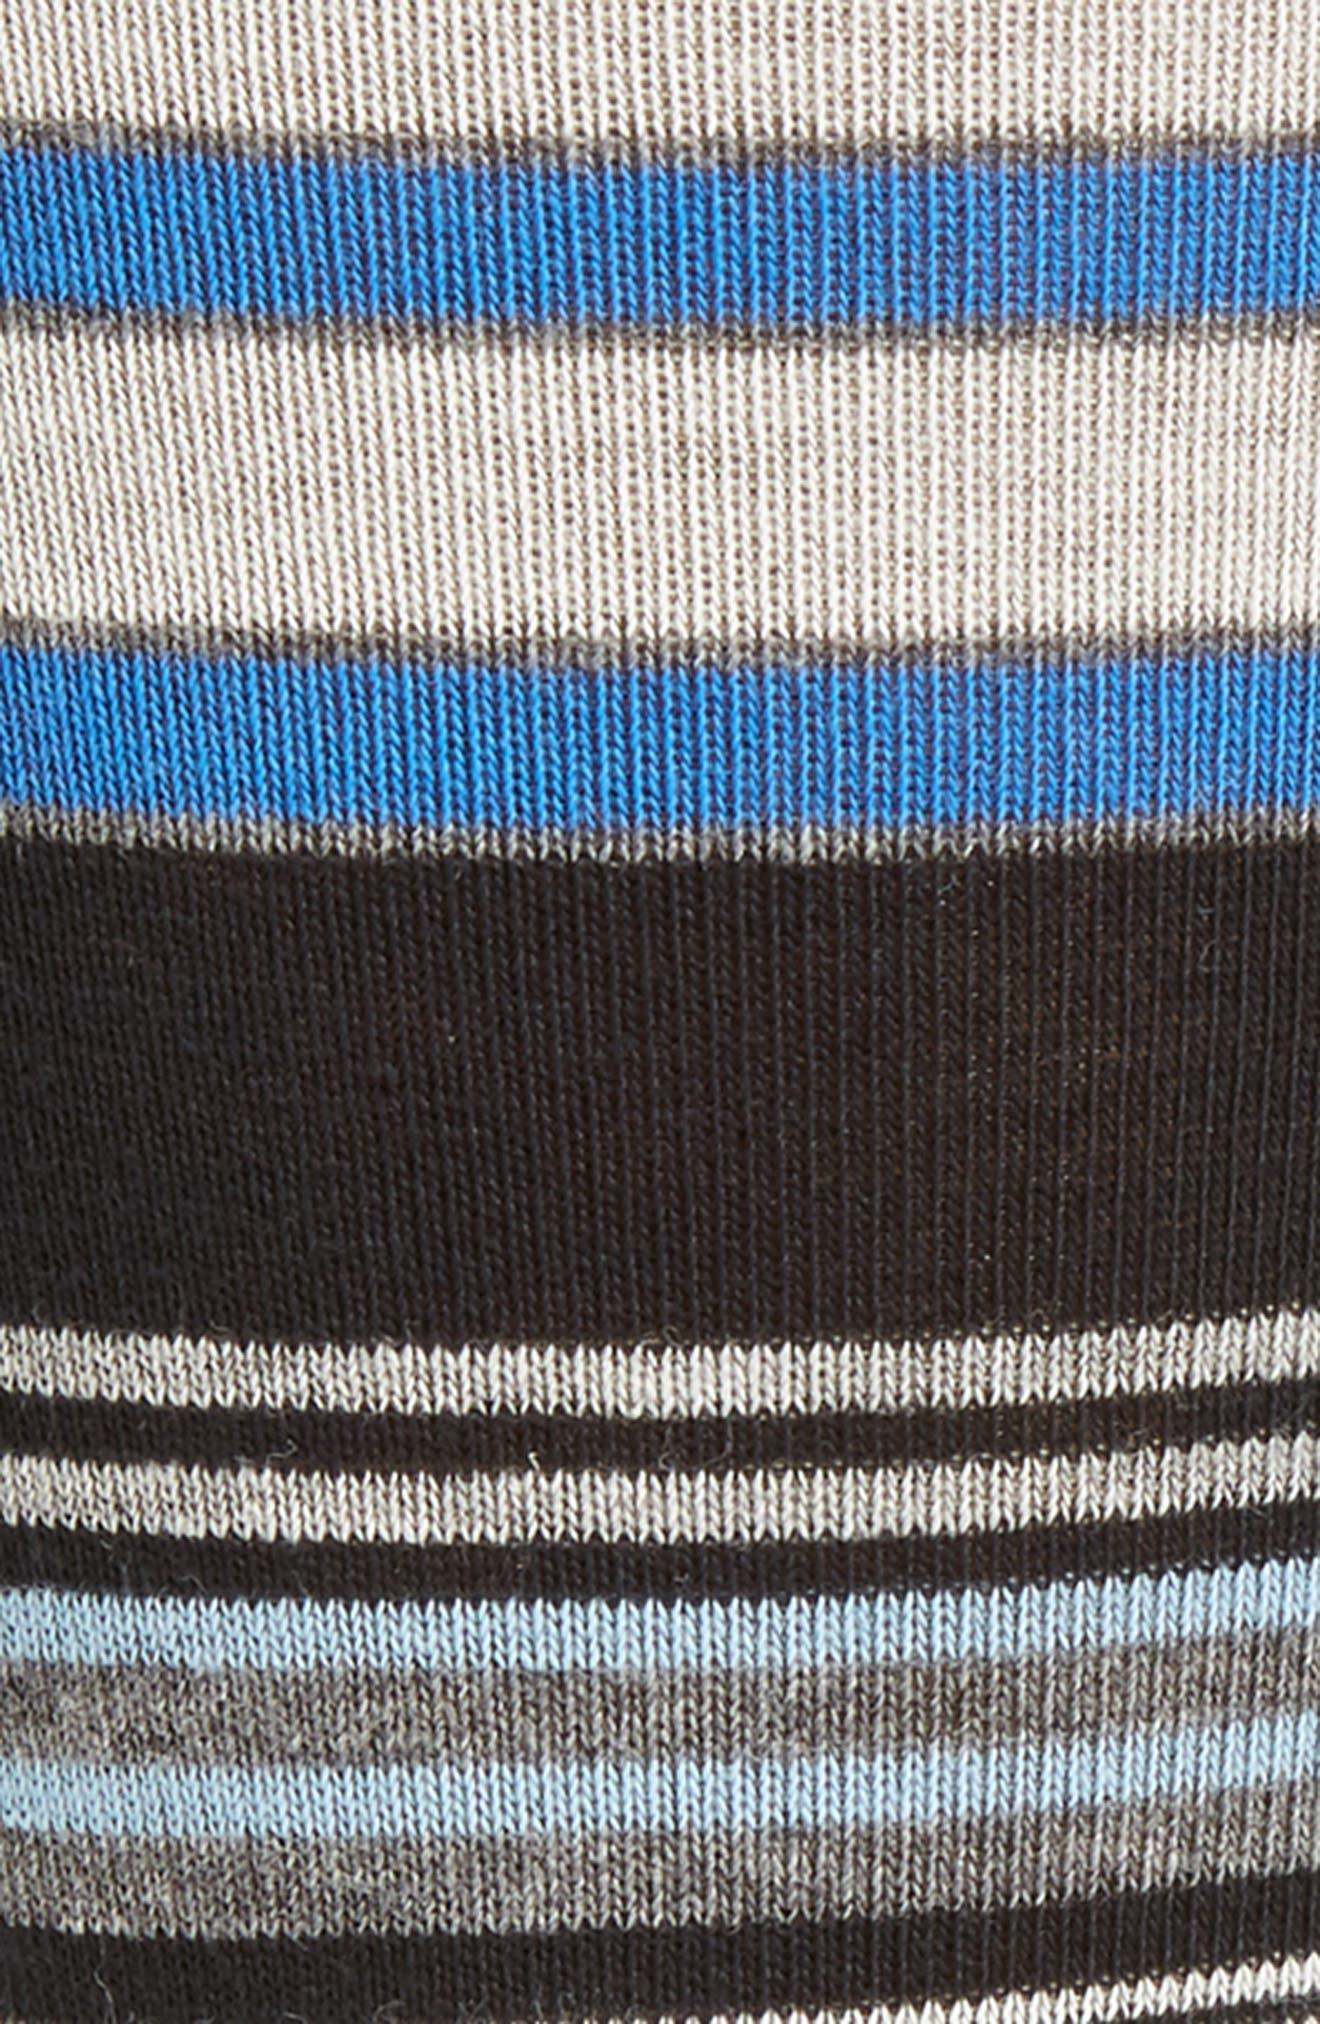 Random Stripe Socks,                             Alternate thumbnail 2, color,                             Black